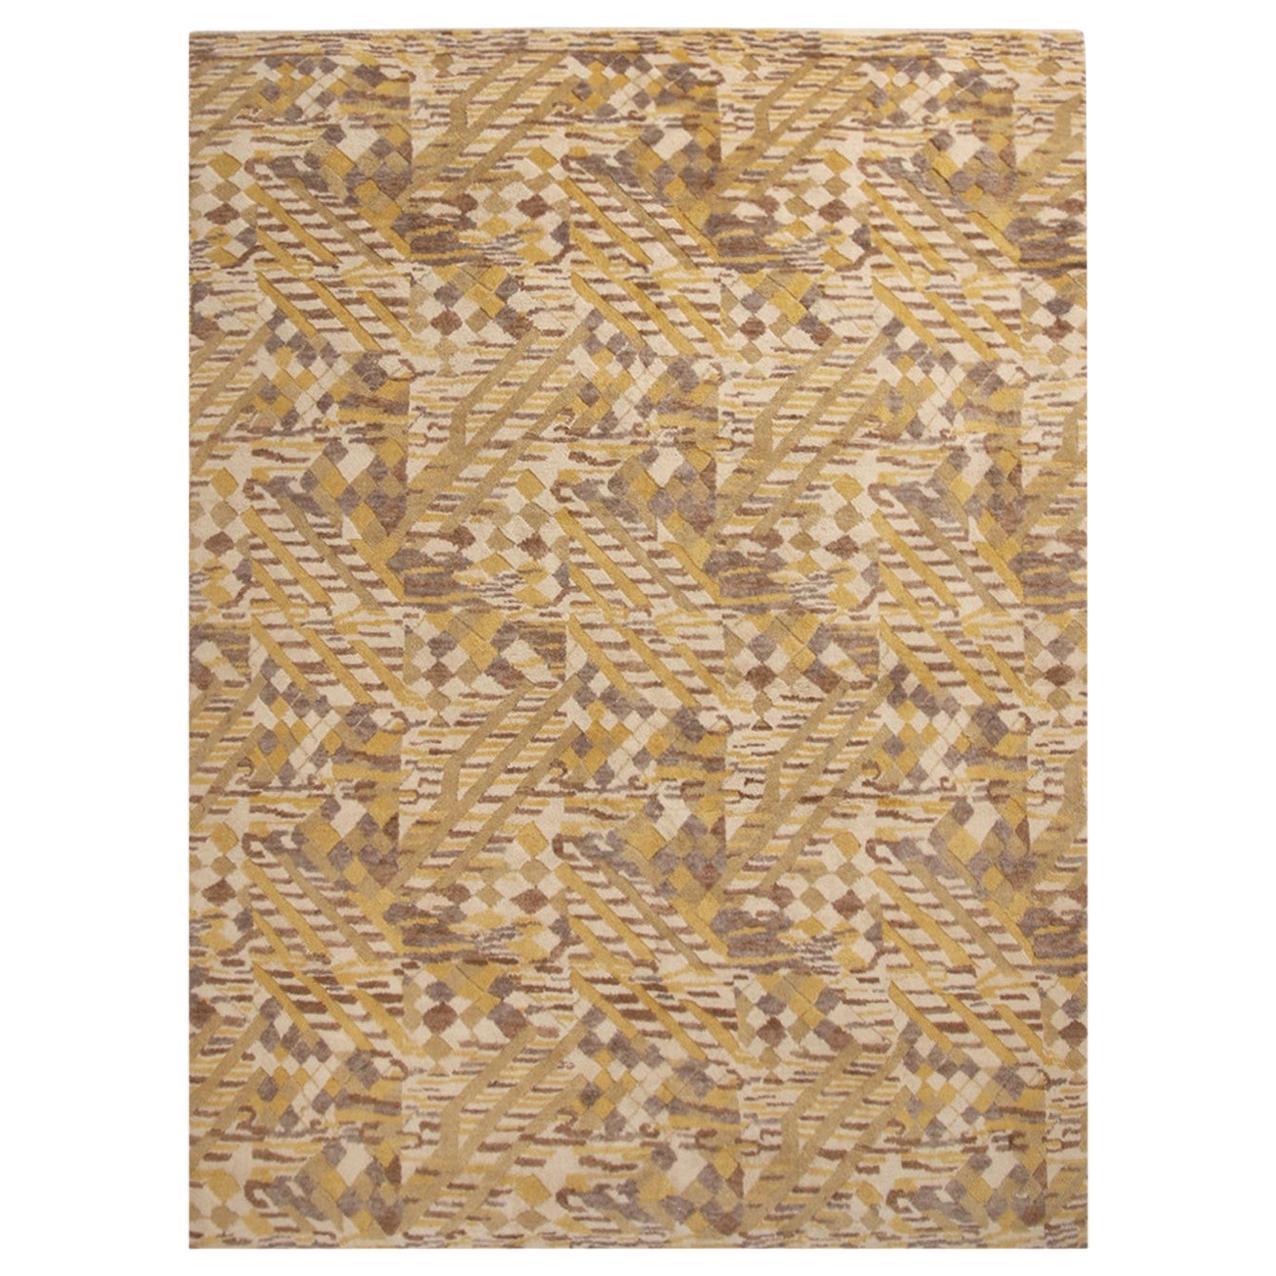 Rug & Kilim's Scandinavian-Inspired Geometric Beige and Yellow Wool Pile Rug